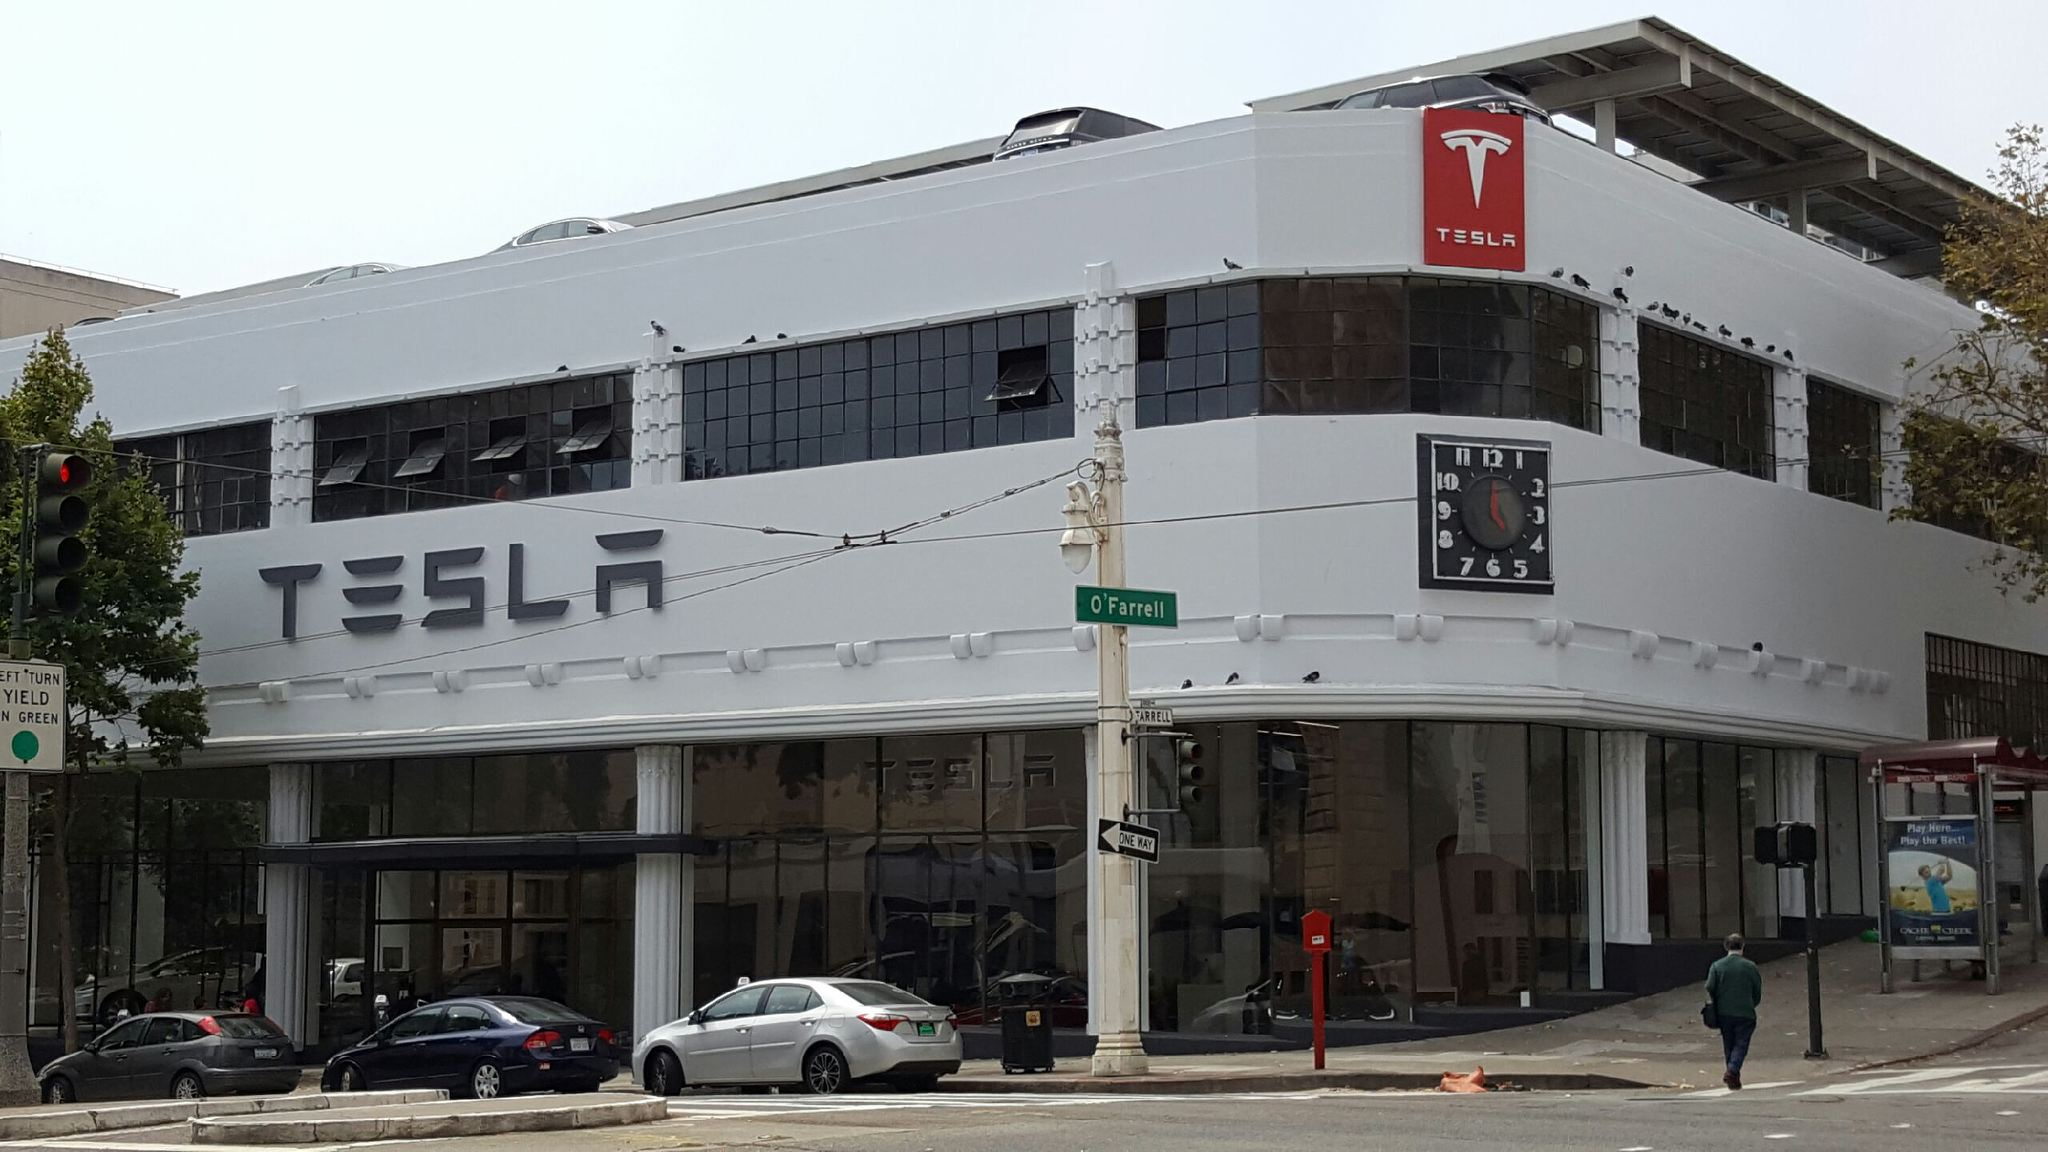 Tesla Charging Station Fees